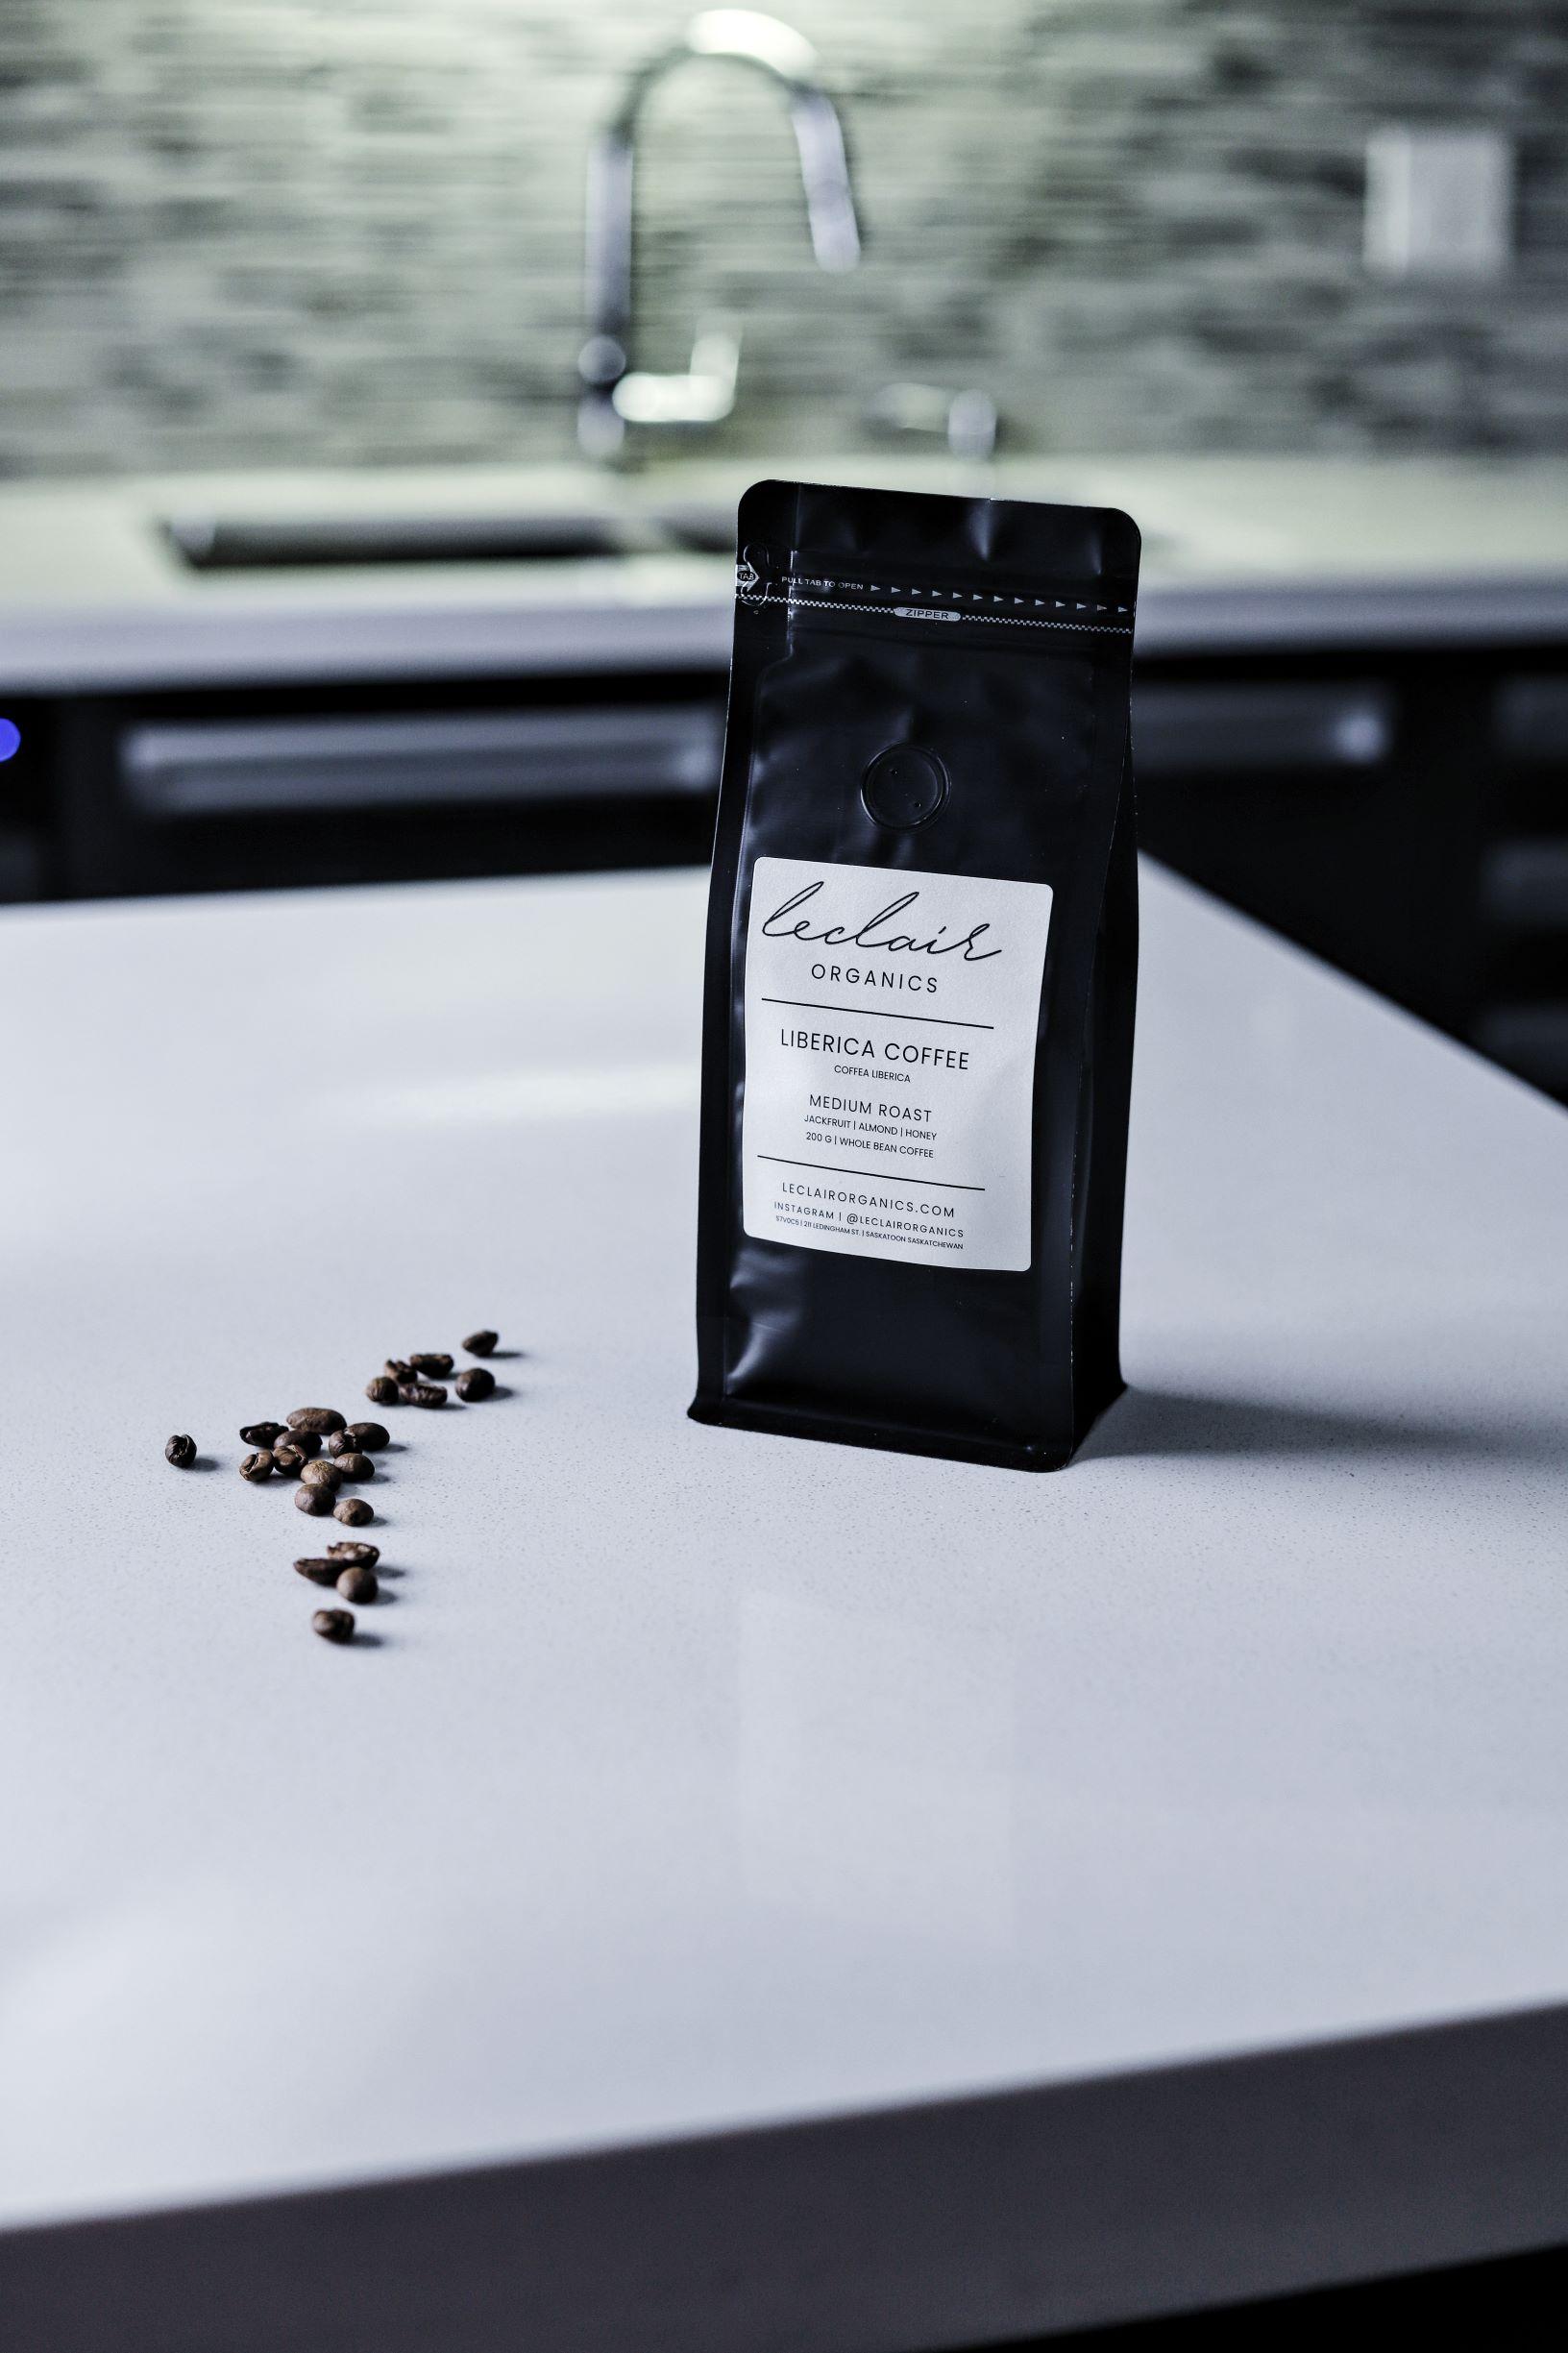 LeClair Organics Saskatoon Founded, Liberica Coffee bag, use in espresso martini recipes